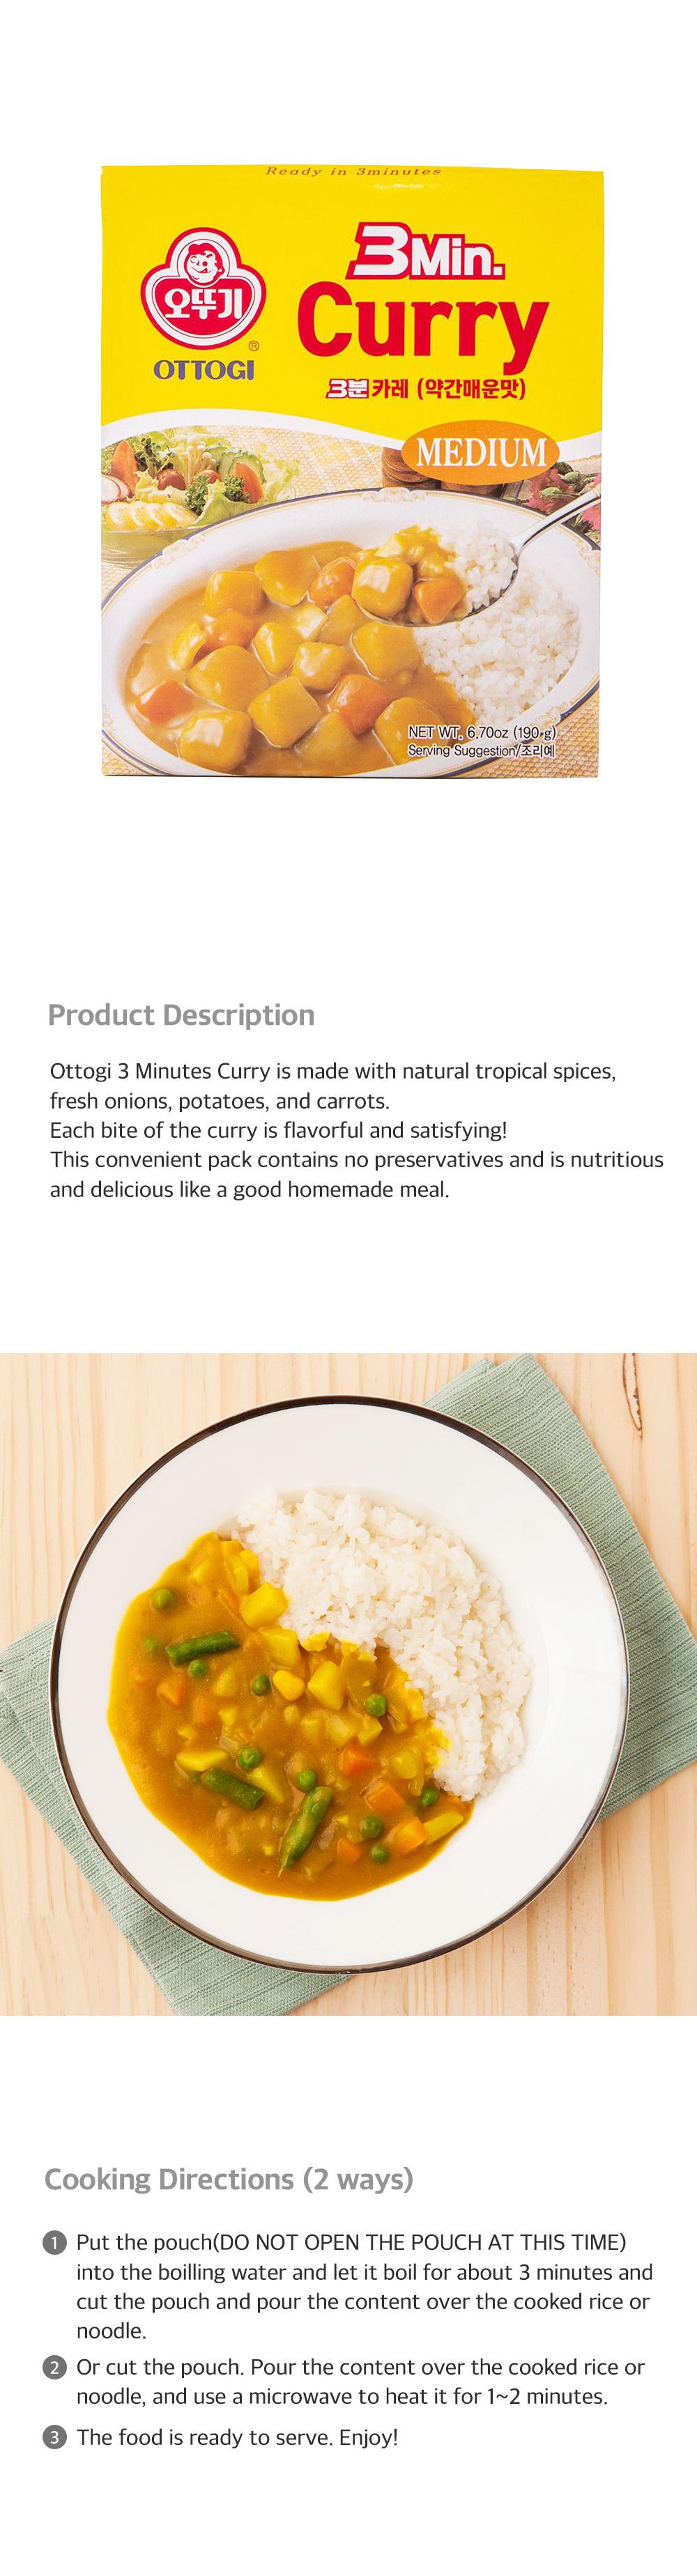 3 Minutes Curry Medium Hot Flavor 6.7oz(190g)